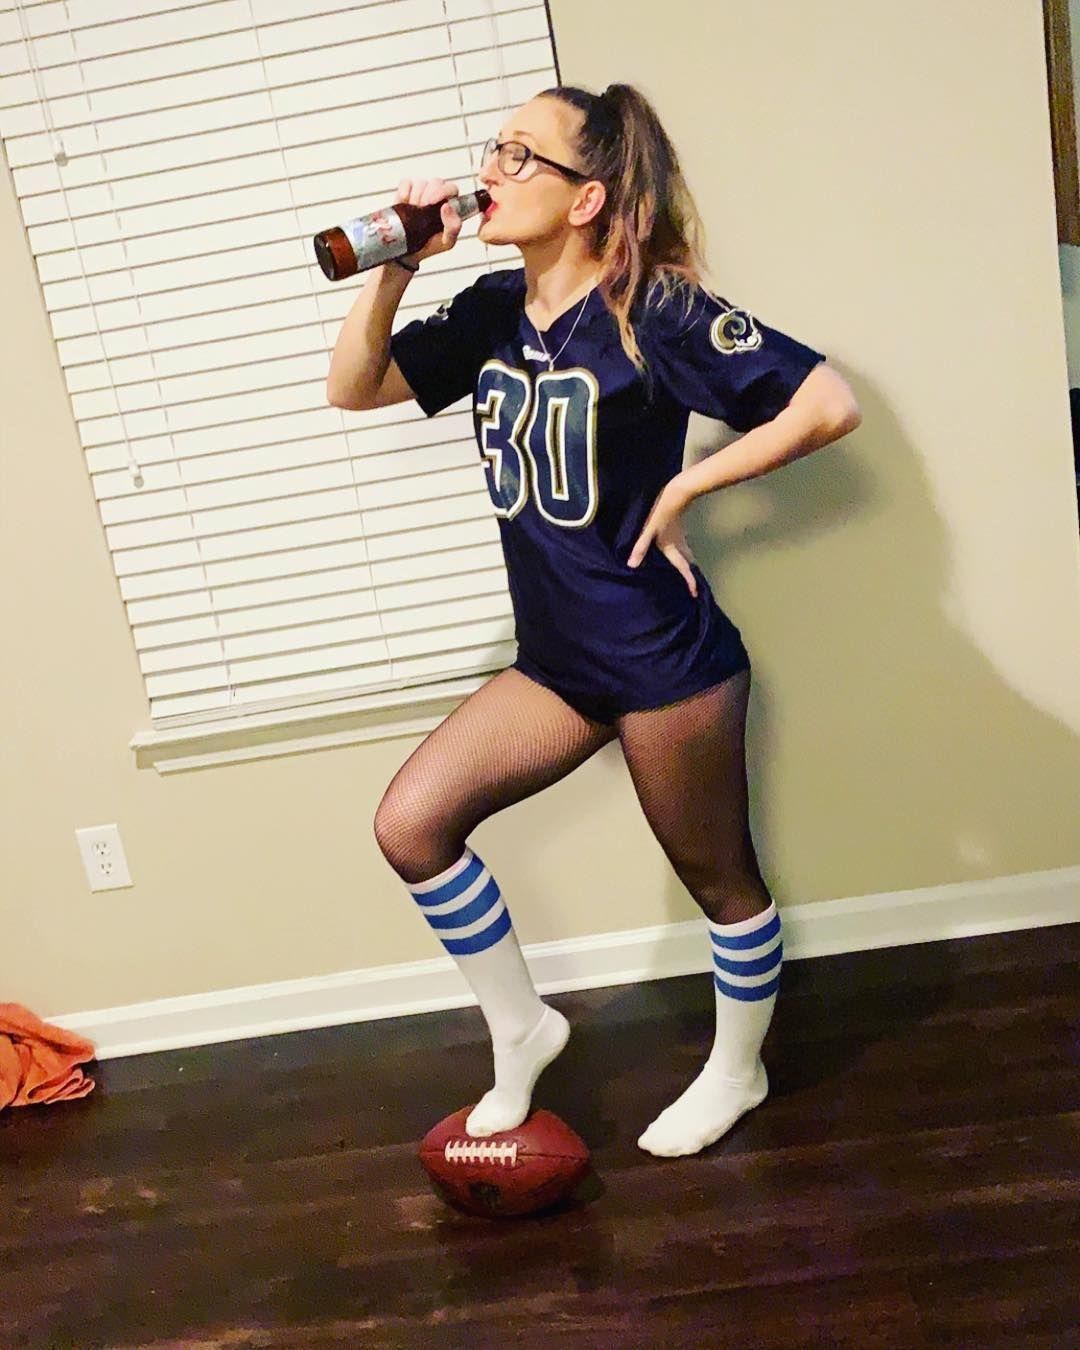 I Ll Have Ya Running Back For More Rams Larams Toddgurley Runningback Halloween Football Running Back Todd Gurley La Rams